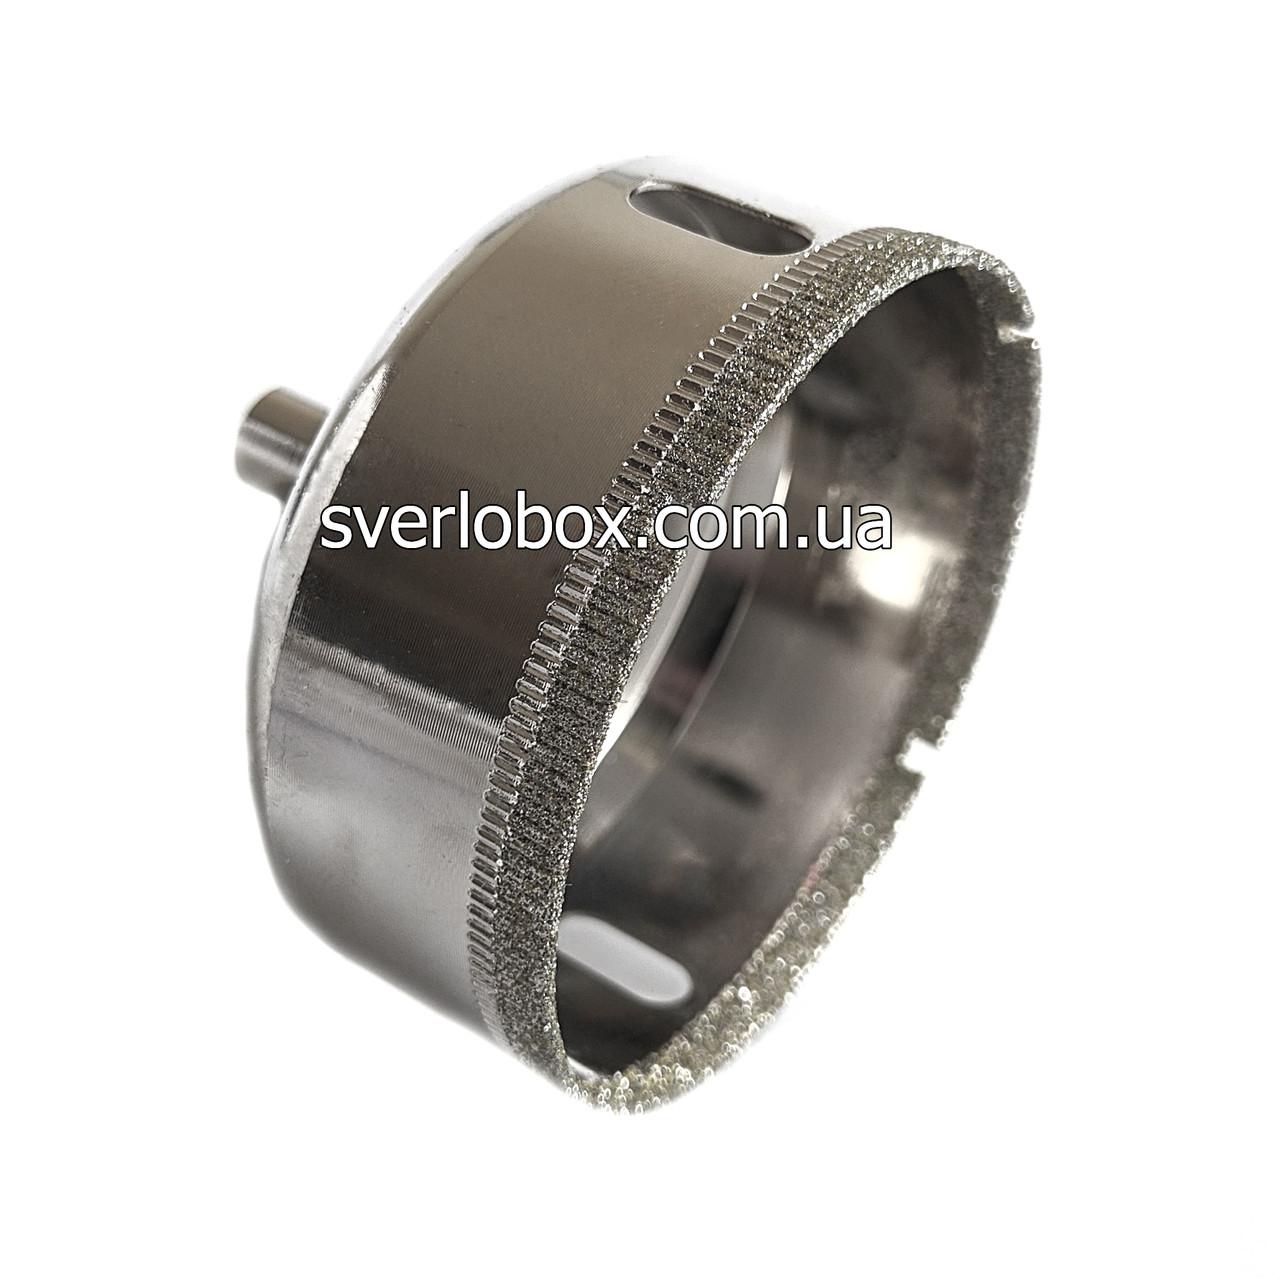 Коронка алмазная 22 мм